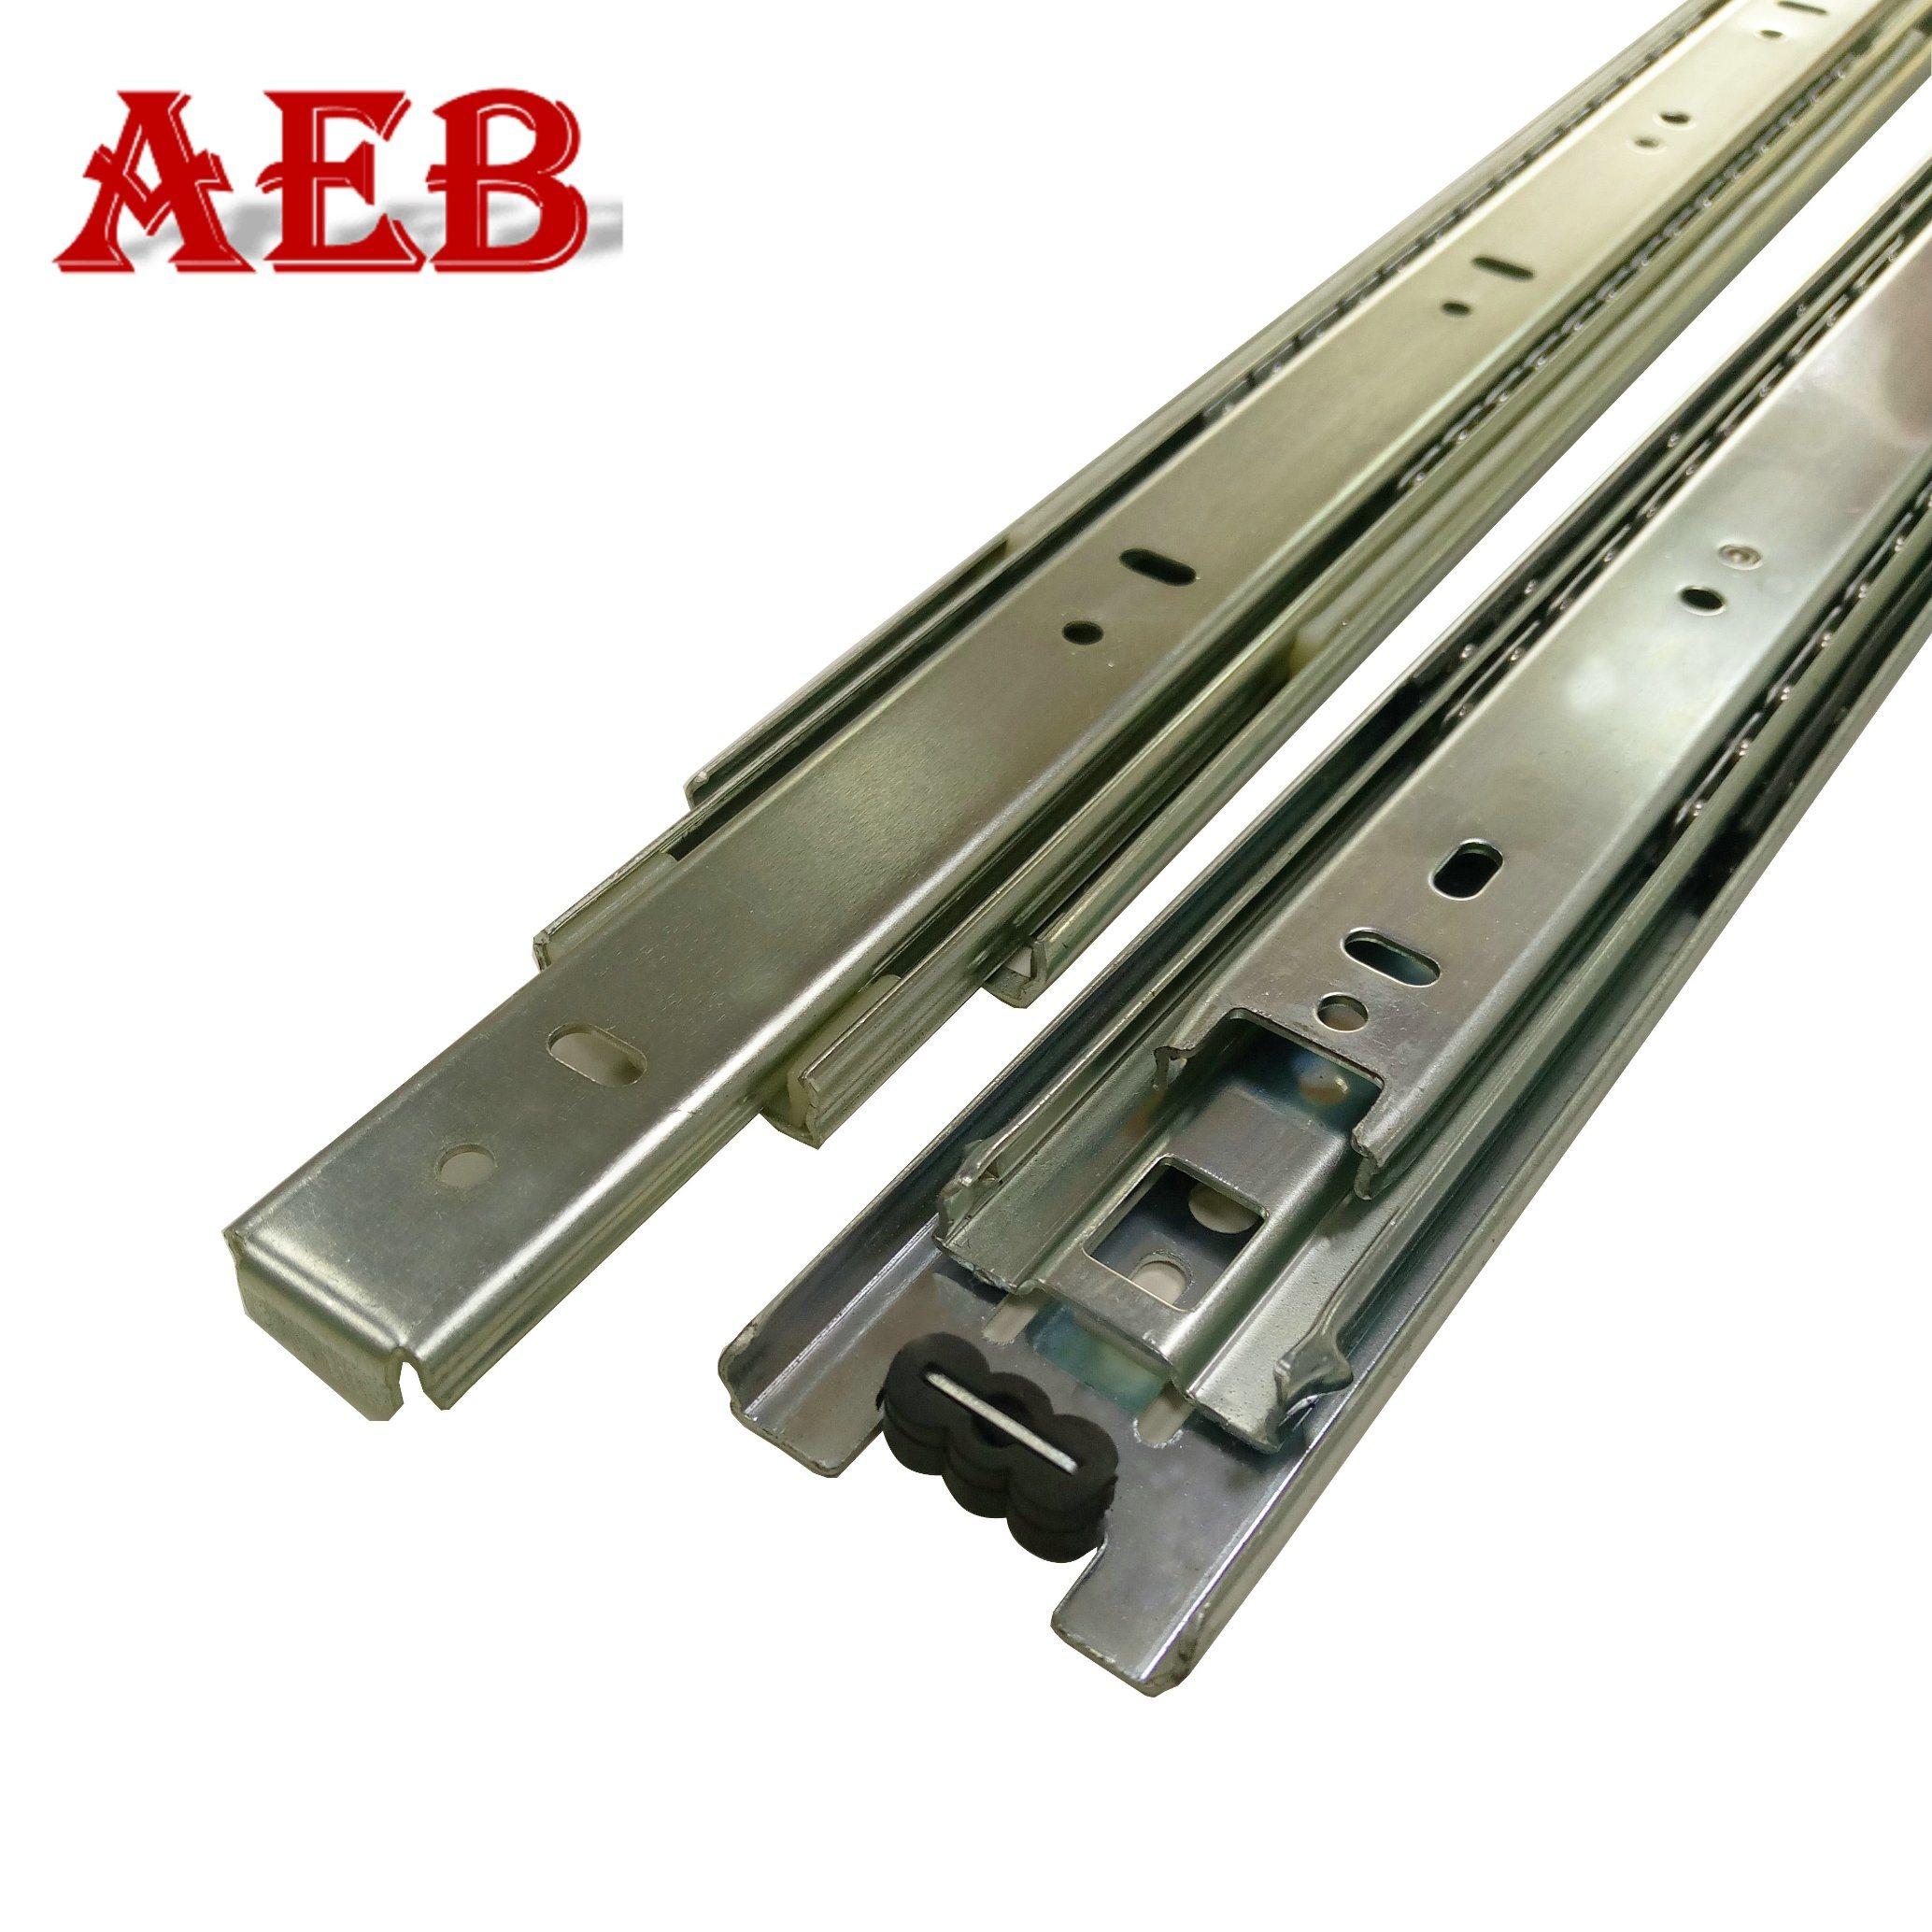 drawers s sale wood sliding kit door aluminum cabinet lowes ikea hardware lock cupboard drawer track